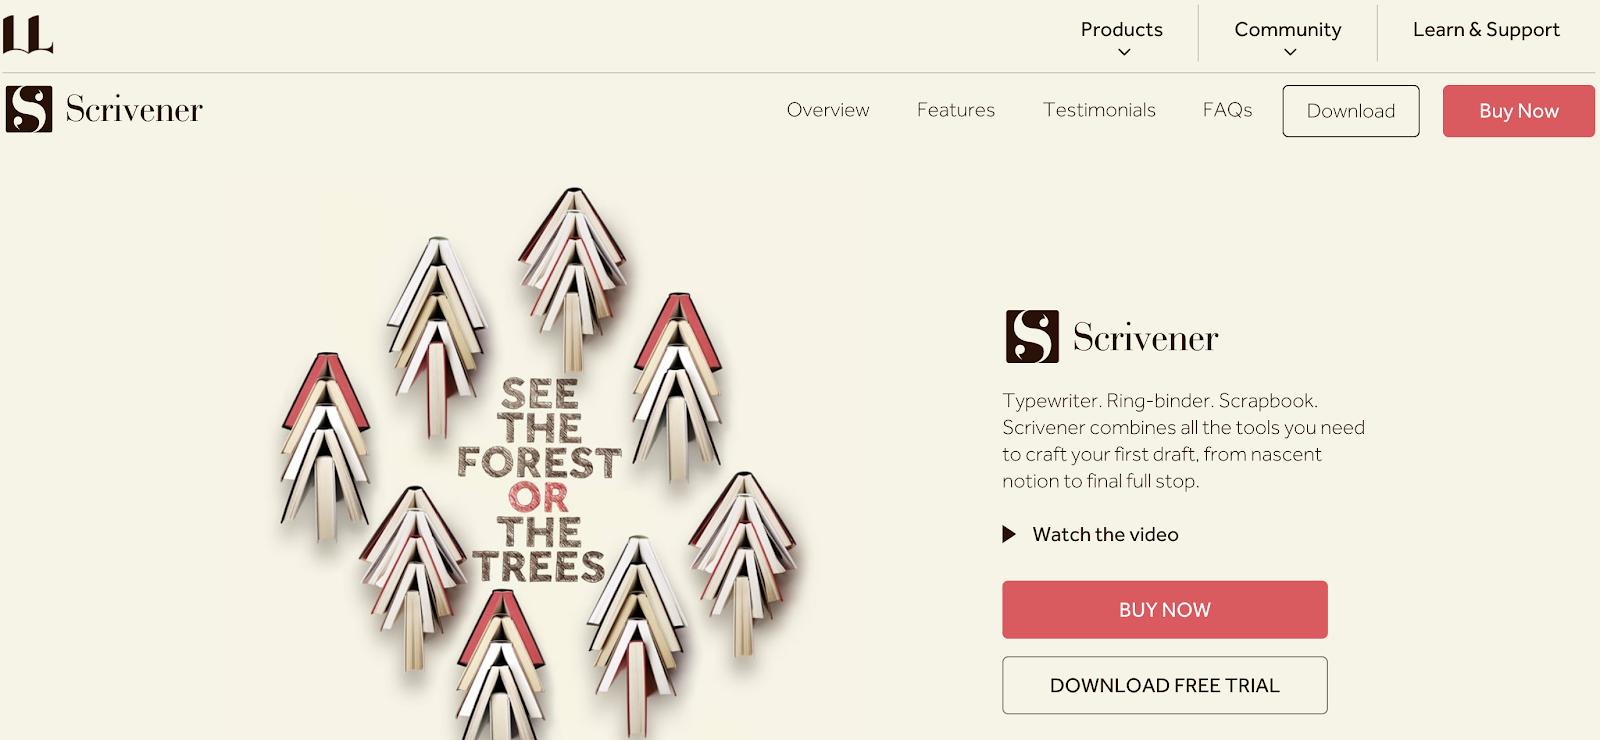 Scrivener Homepage Screenshot (eBook Designer Tool)